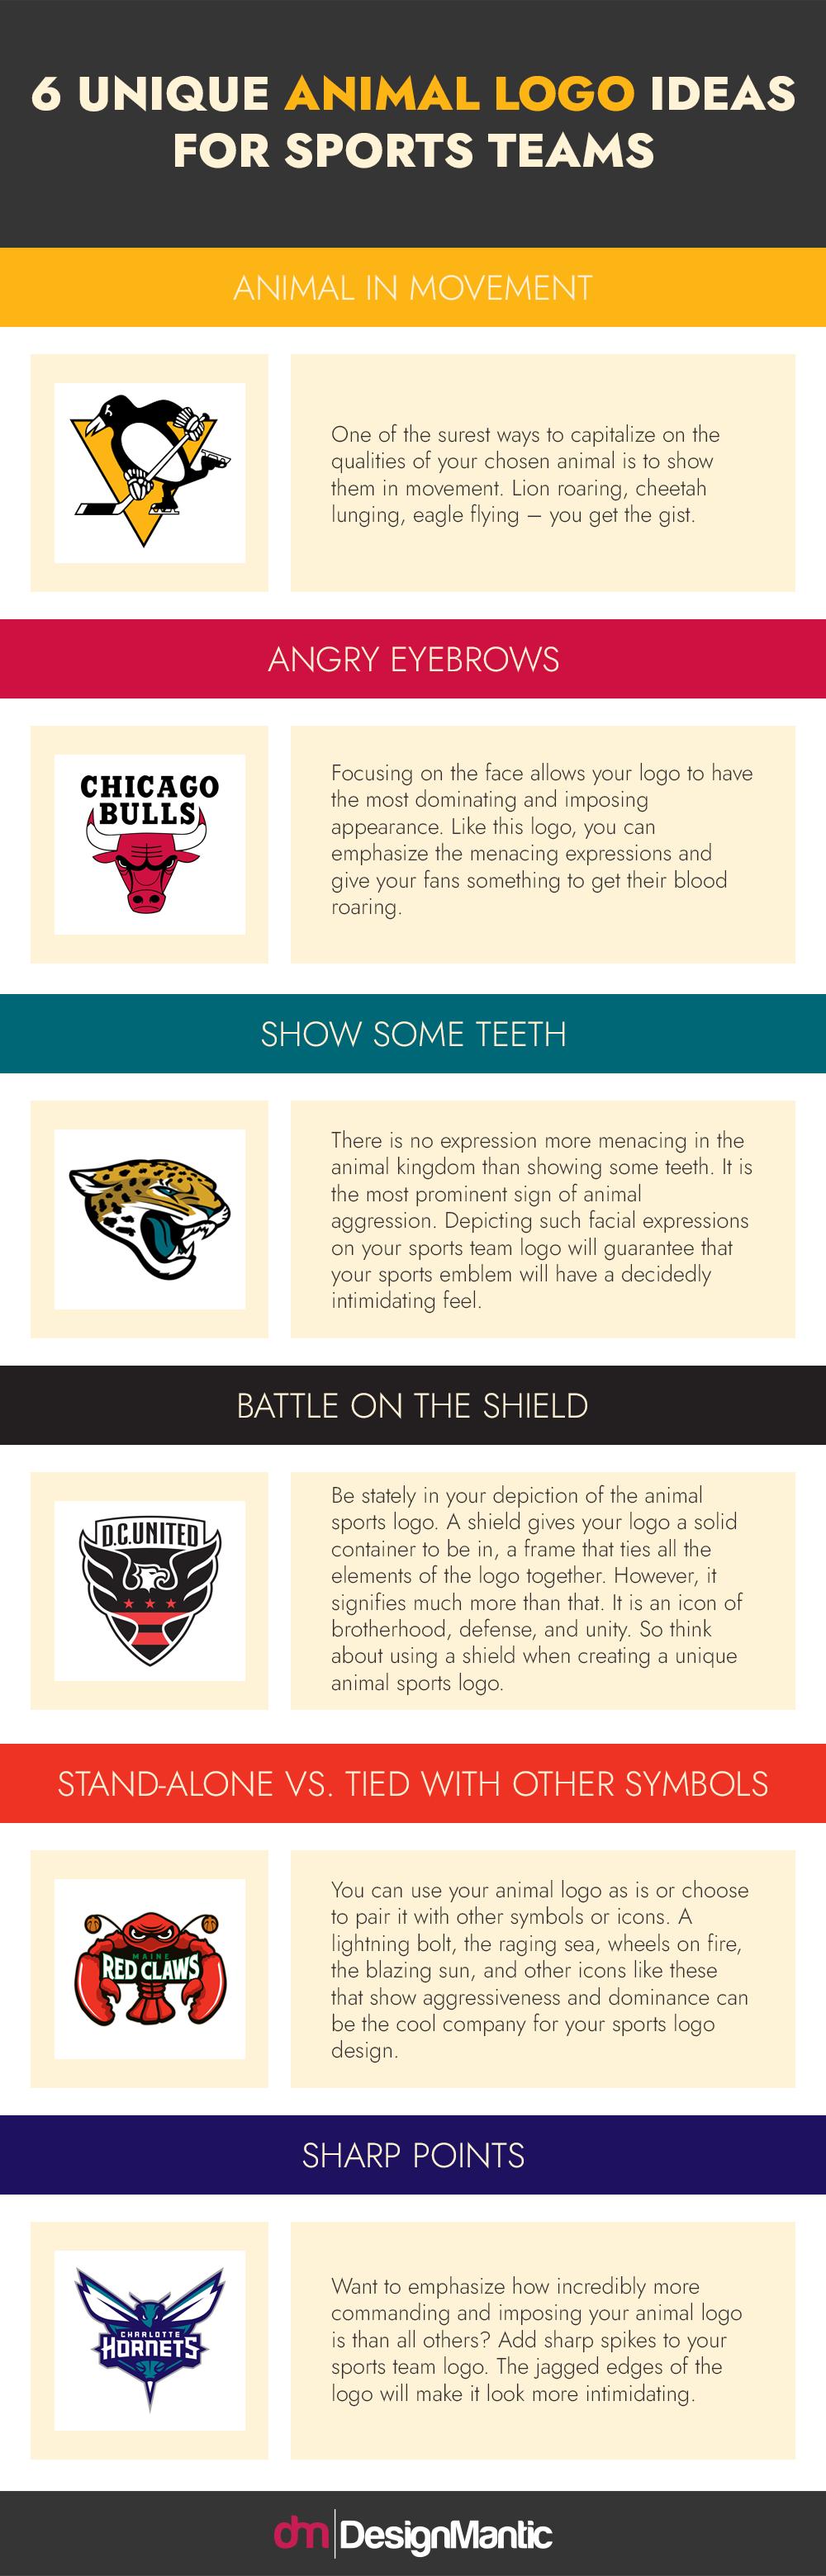 Animal Logo Ideas For Sports Teams